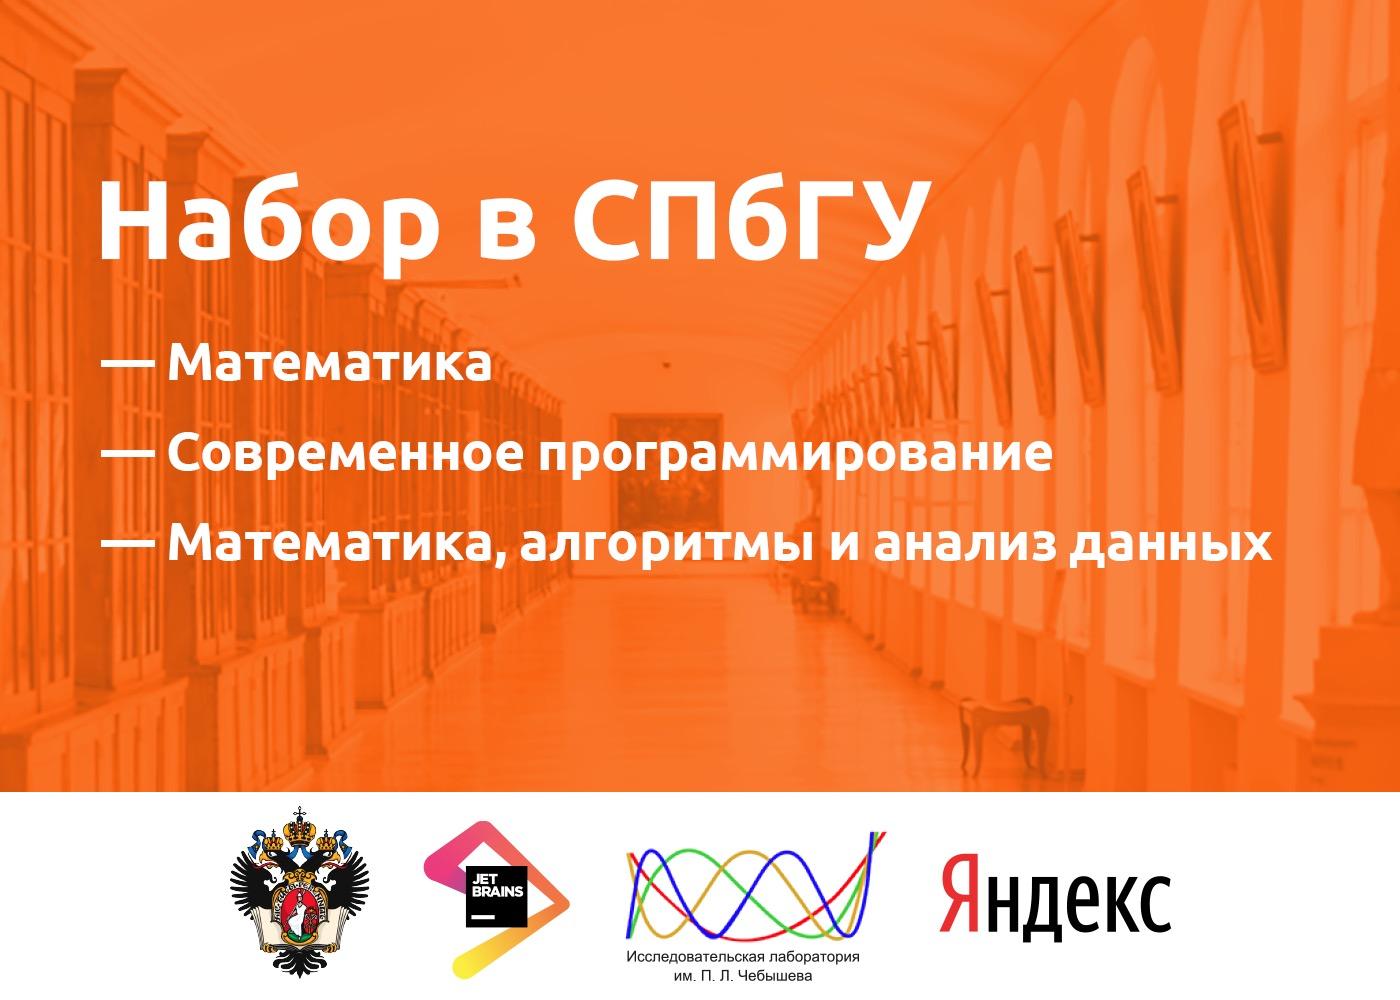 Набор в бакалавриат СПбГУ при поддержке JetBrains и Яндекса